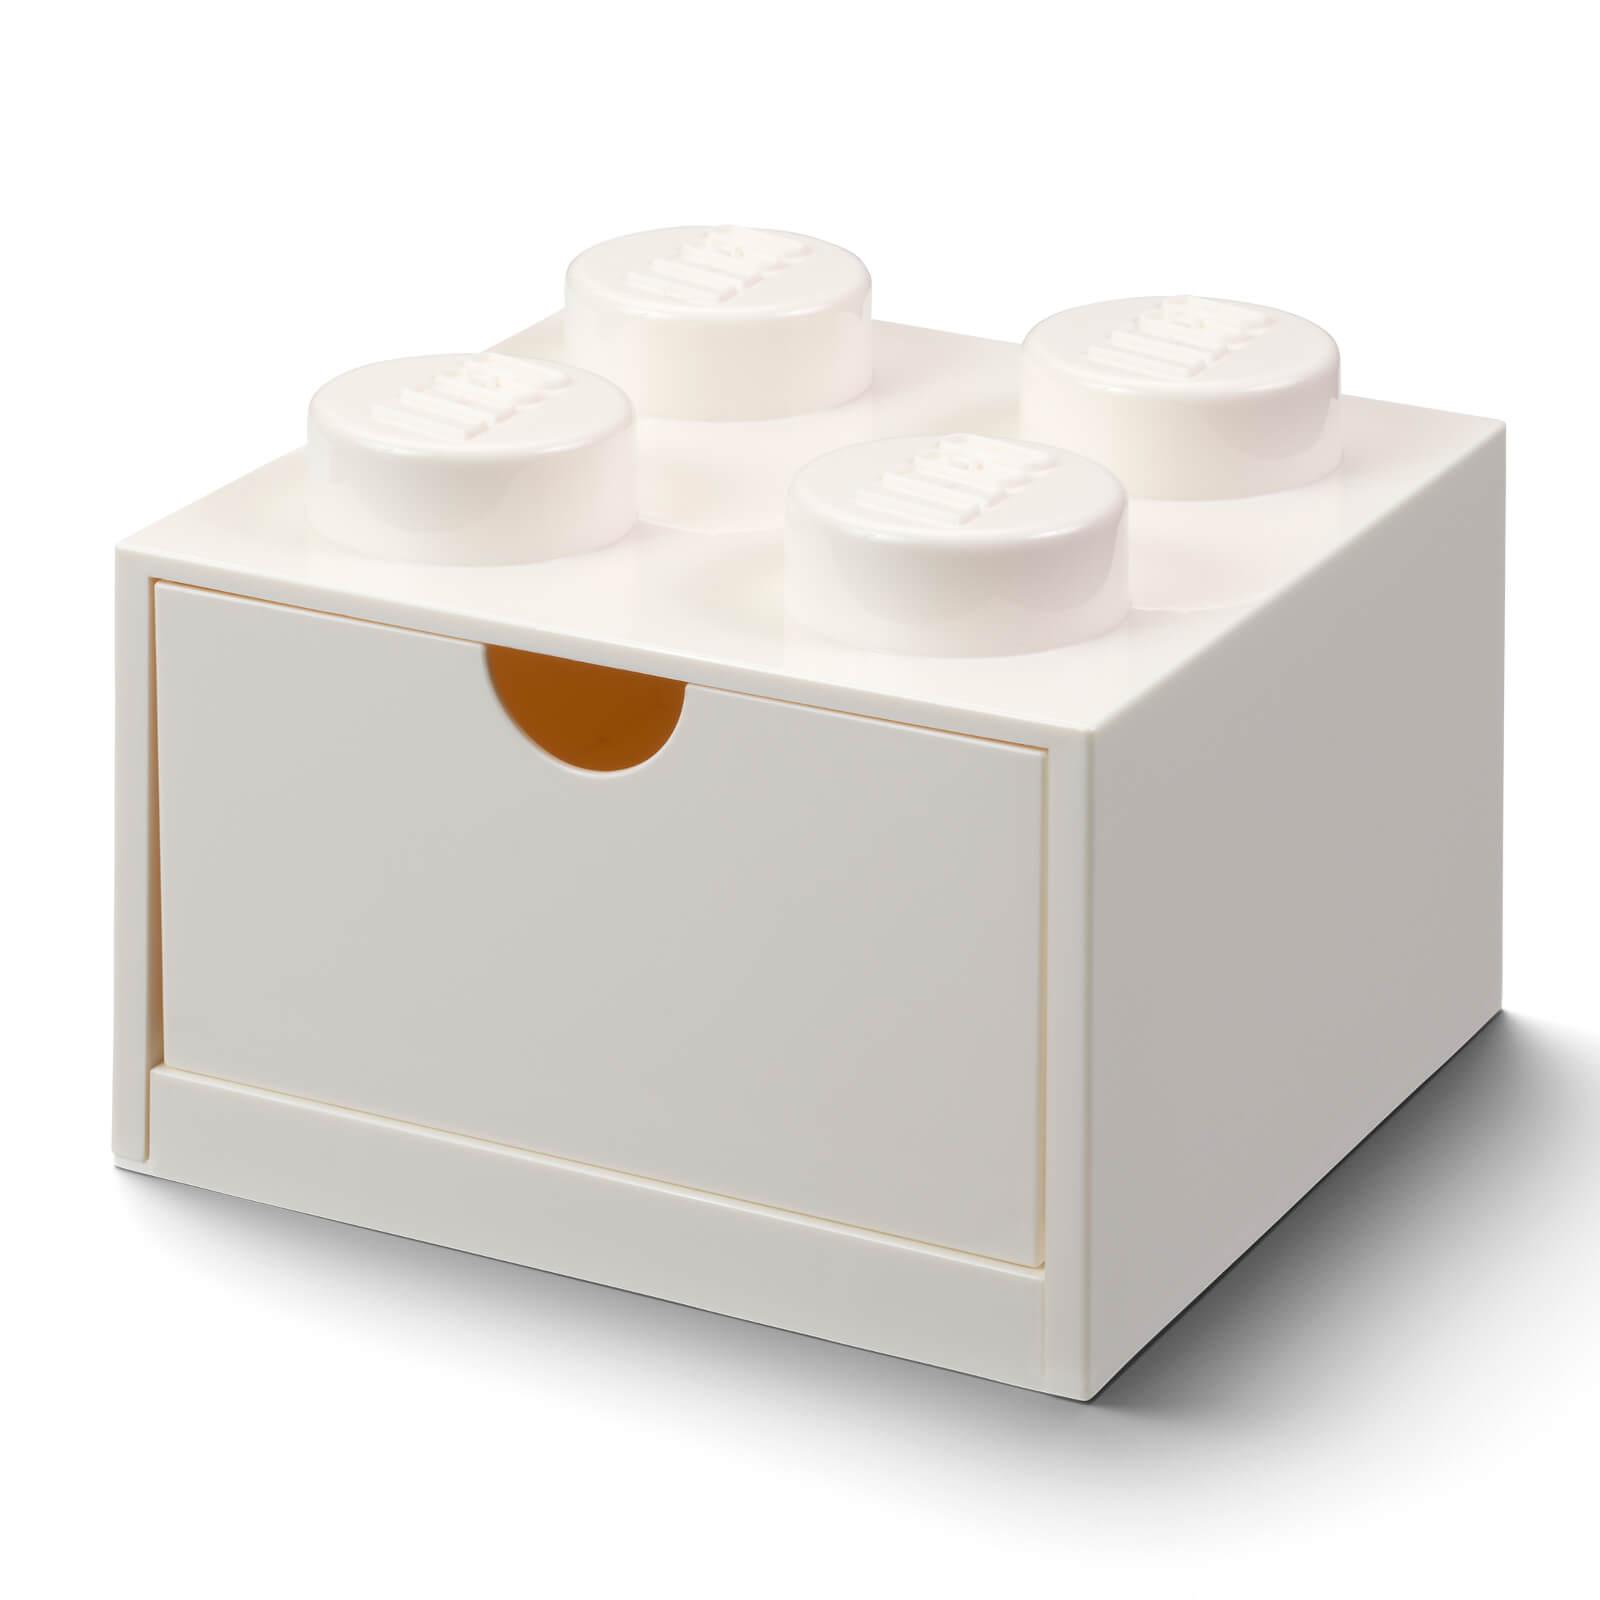 Image of LEGO Storage Desk Drawer 4 - White